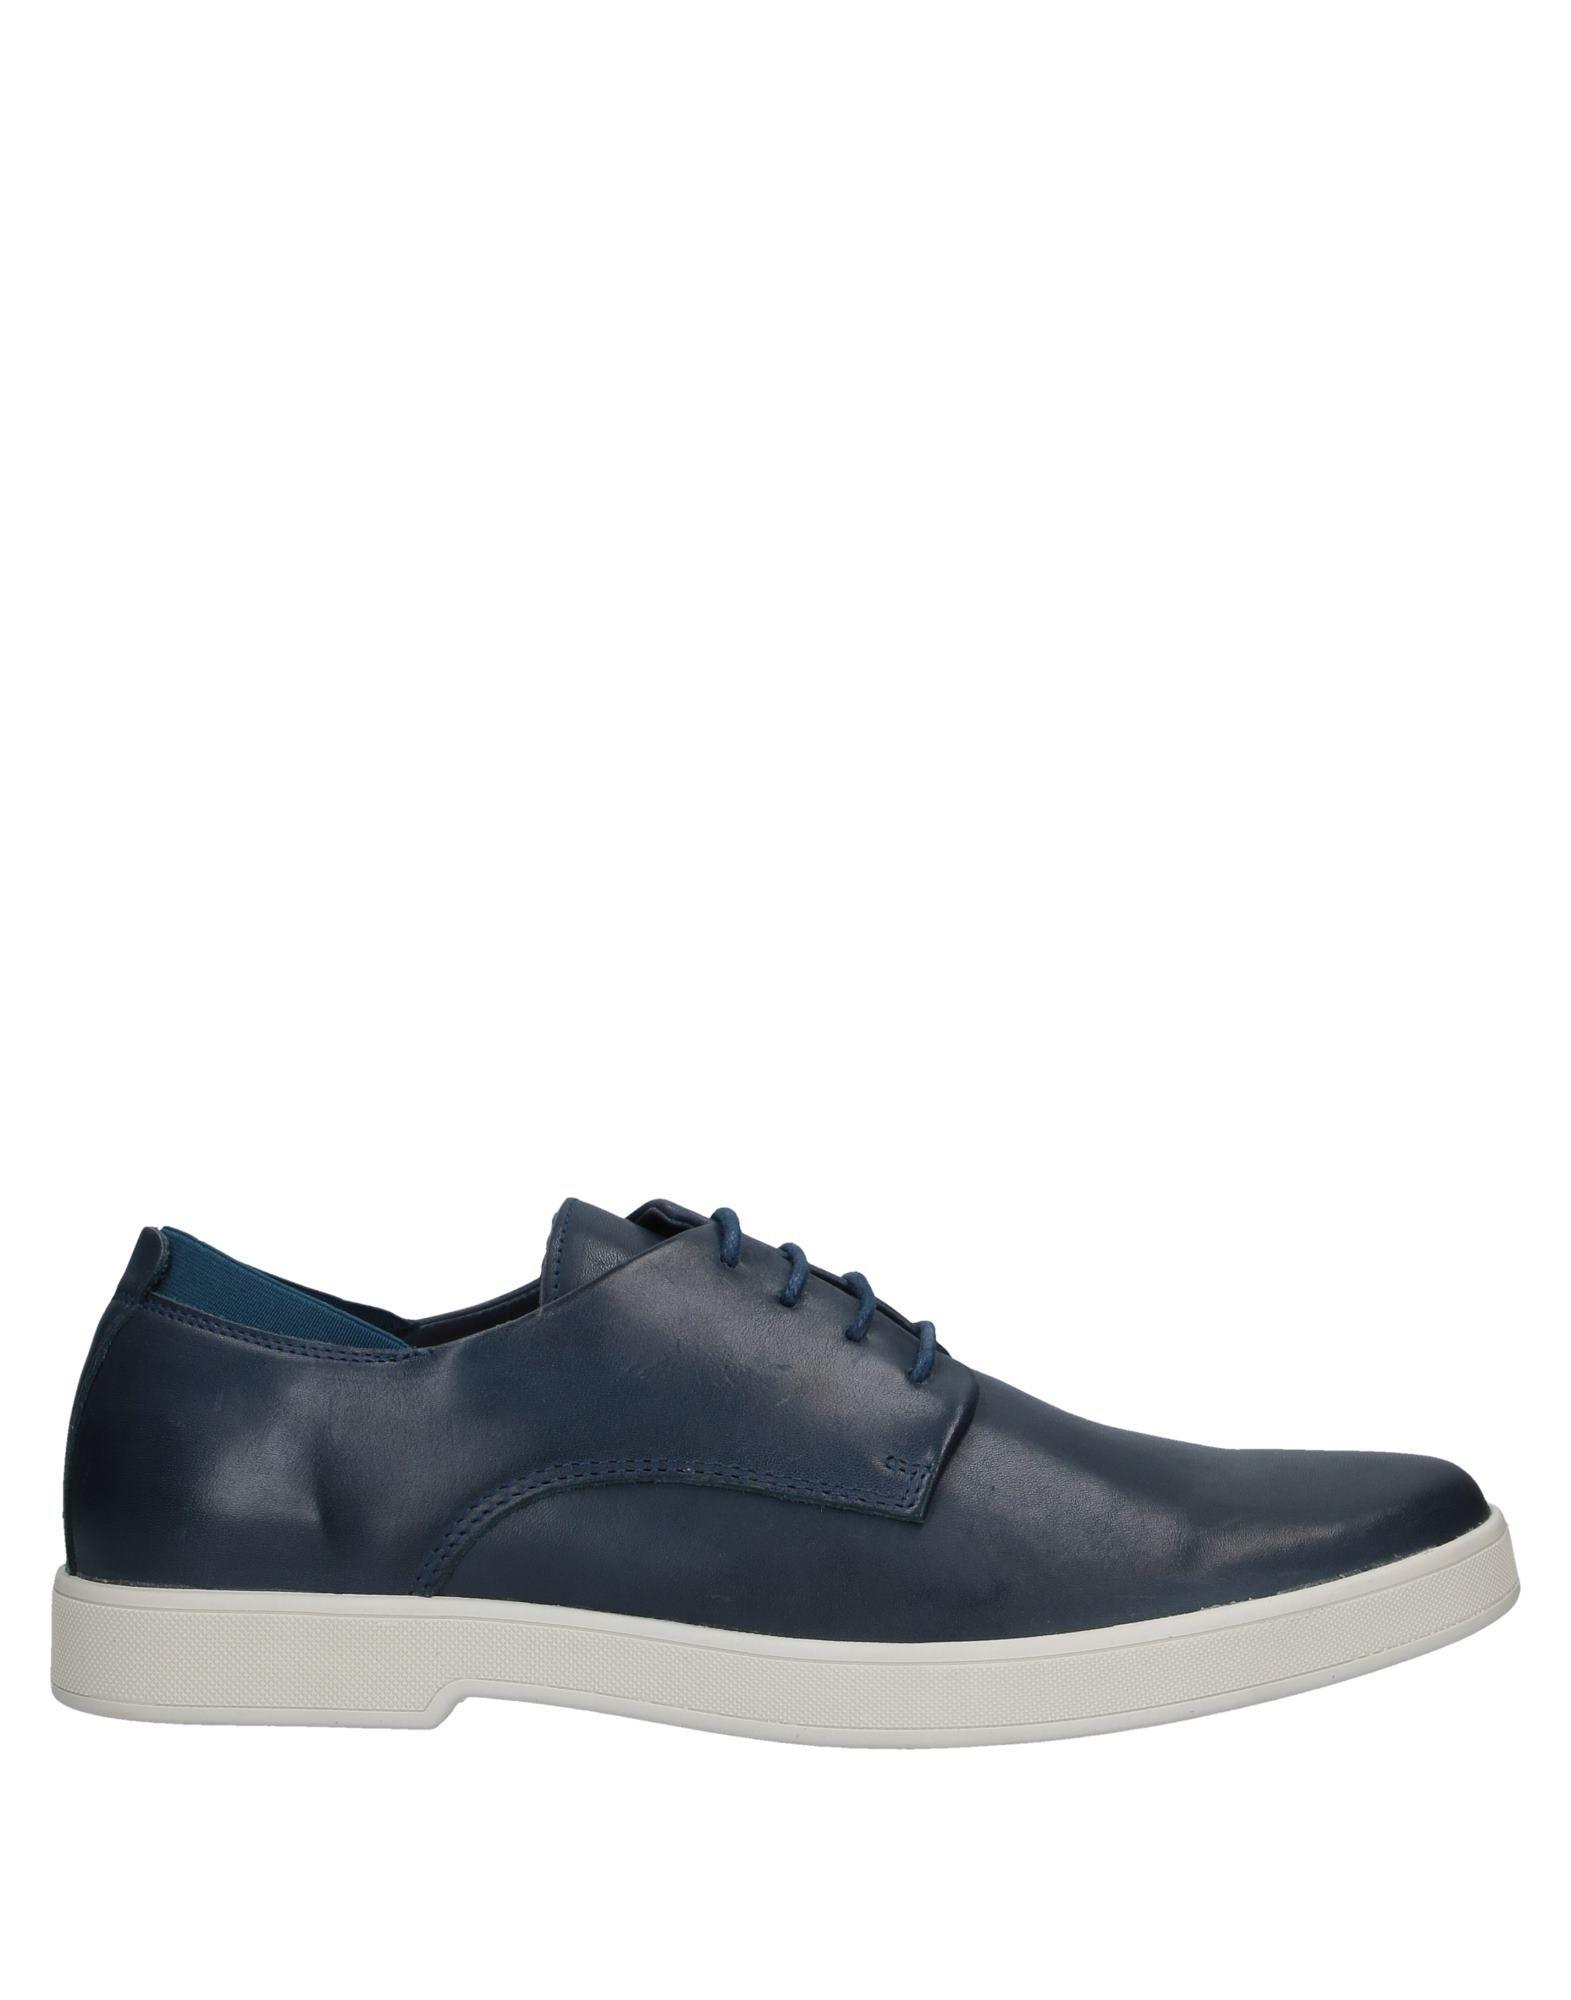 Chaussures À Lacets Impronte Homme - Chaussures À Lacets Impronte   - 11730850FN